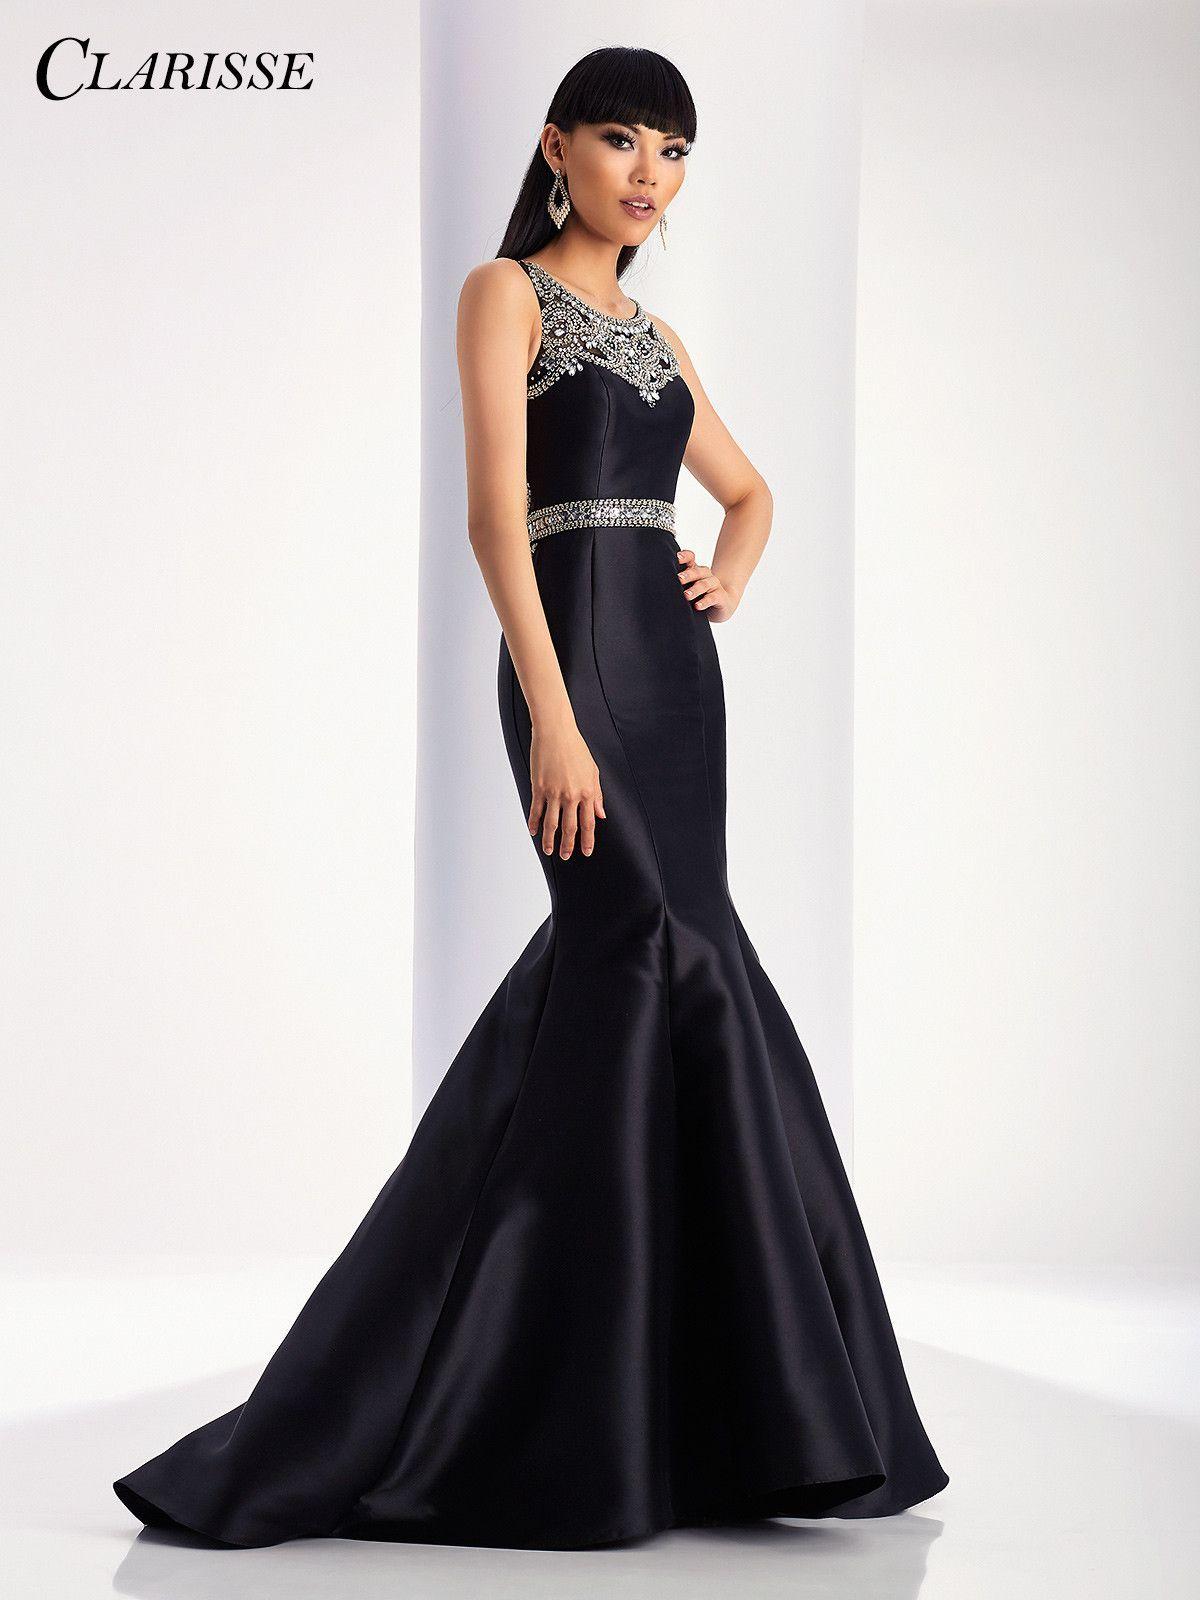 Clarisse prom black mermaid prom dress products pinterest